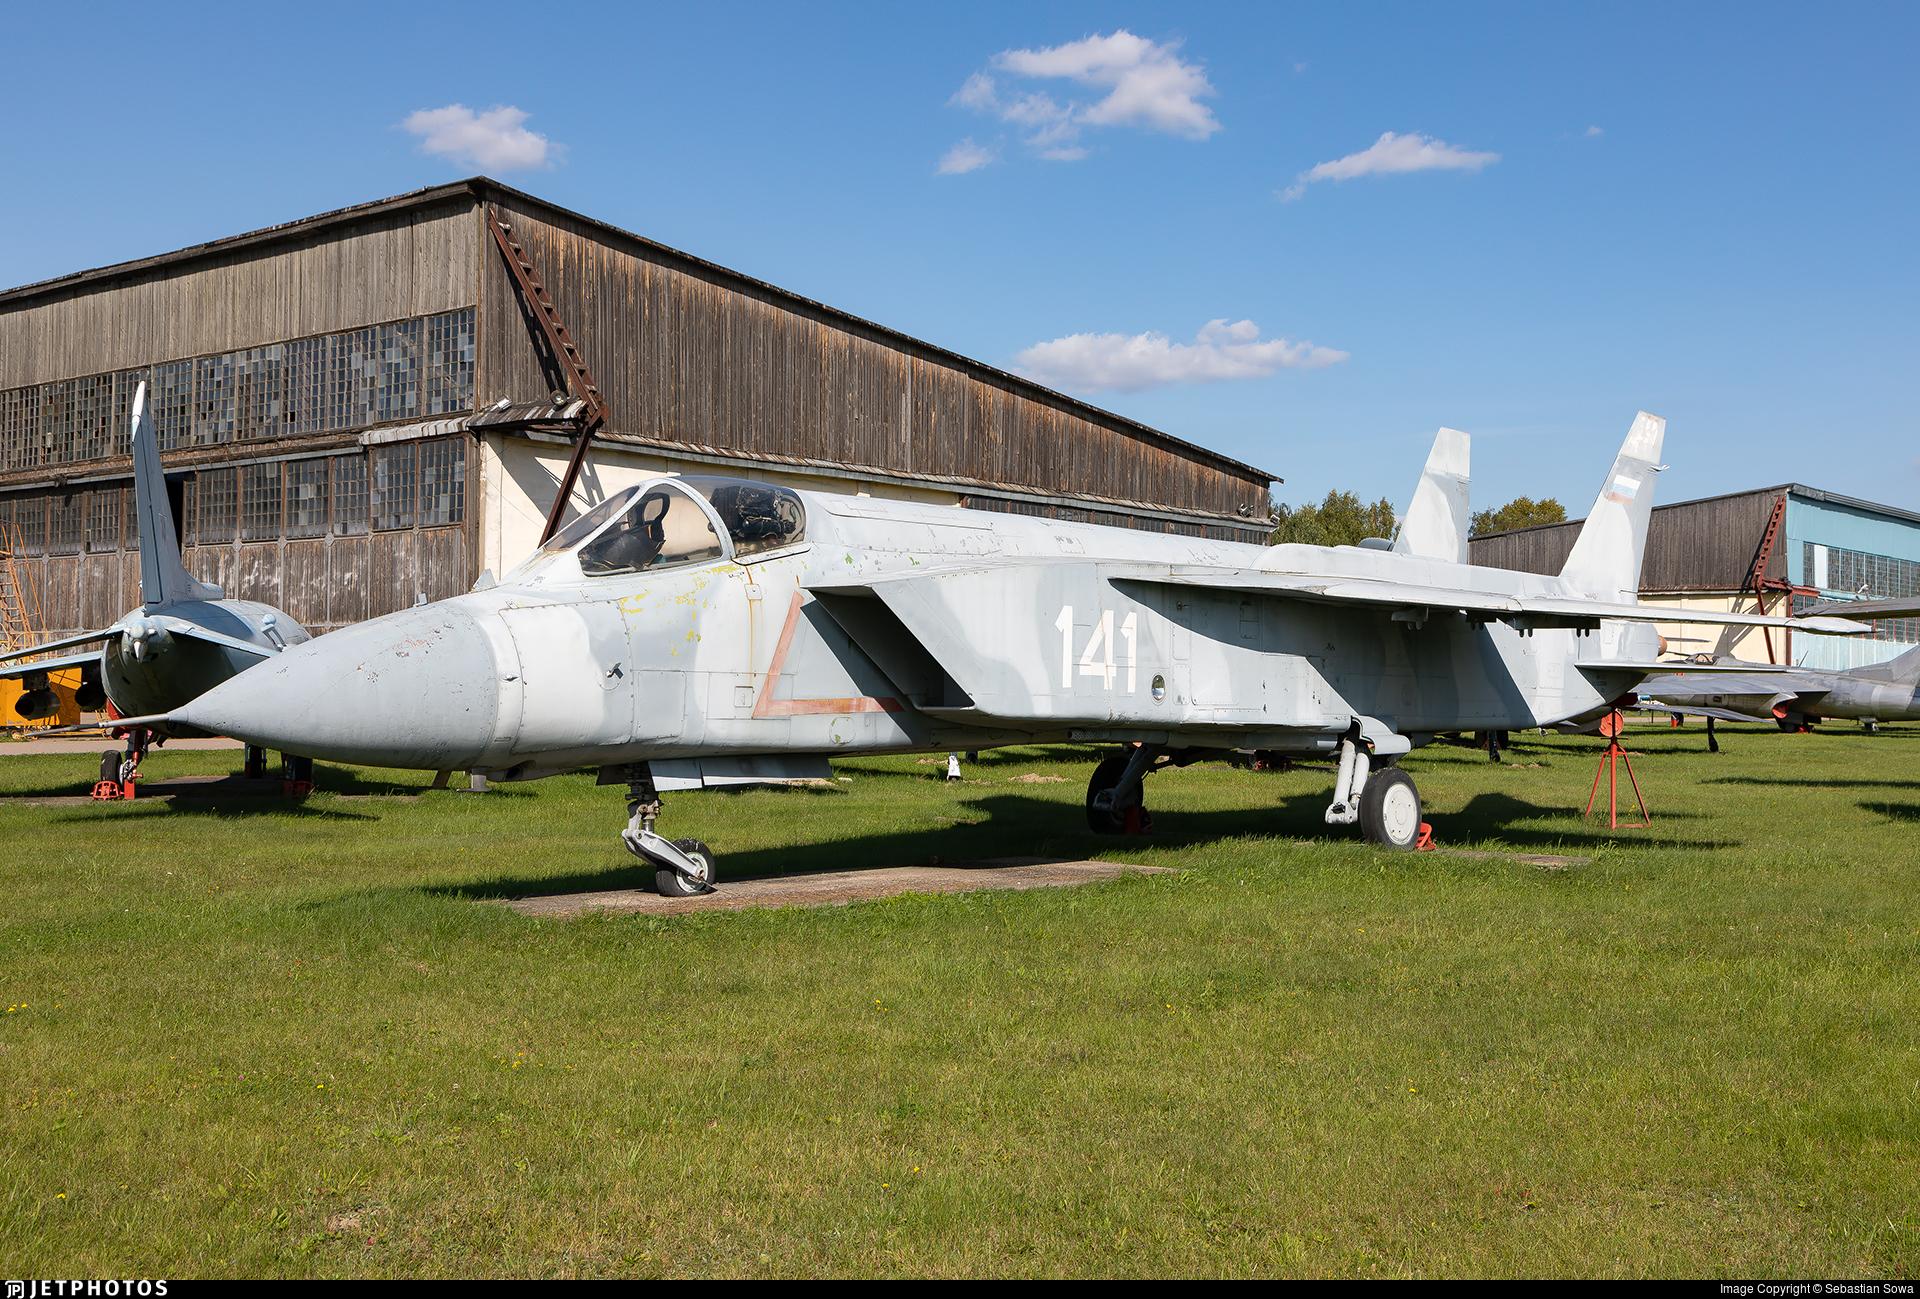 141 - Yakovlev Yak-141 Freestyle - Russia - Navy